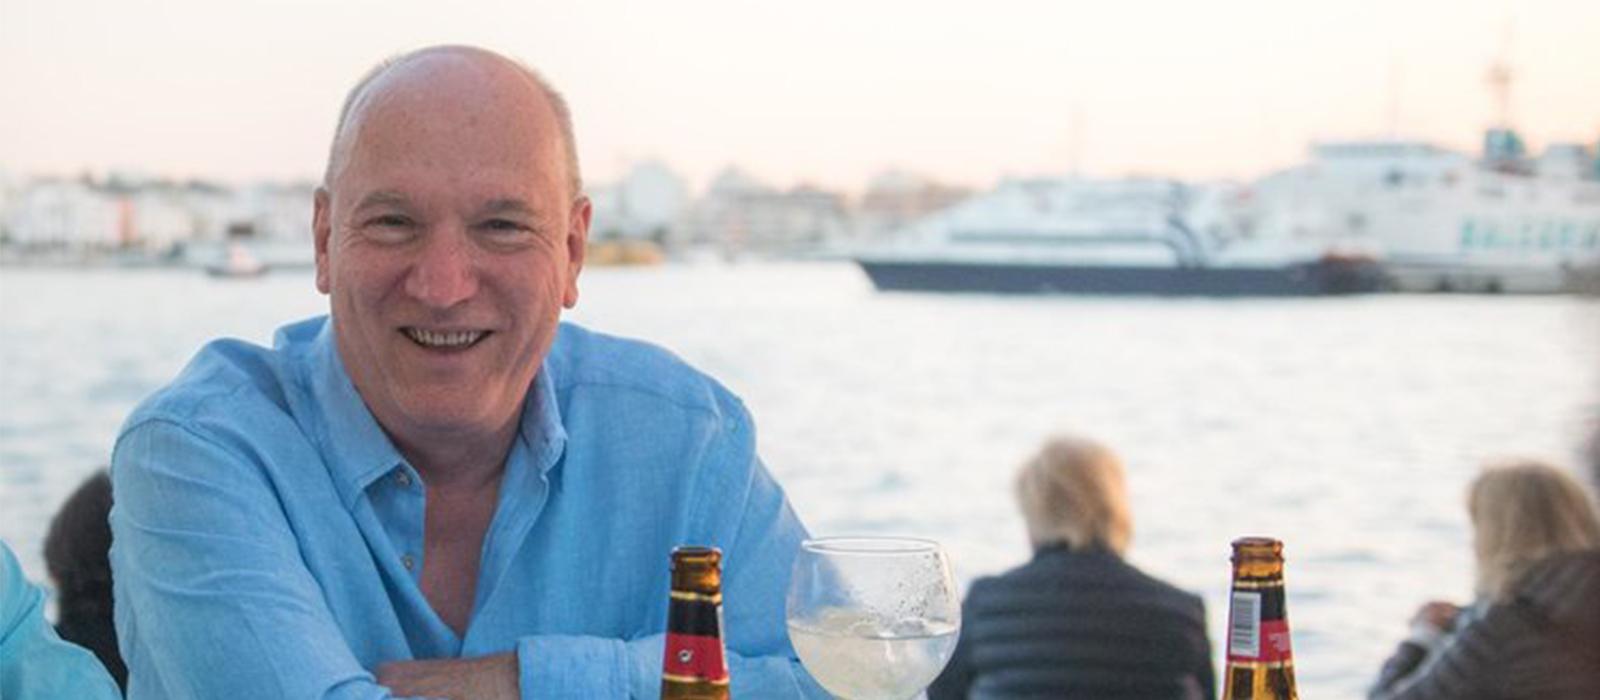 Superyacht-captain-saxon-insurance-brokers-private-clients-wealth-la-calma-ibiza.jpg